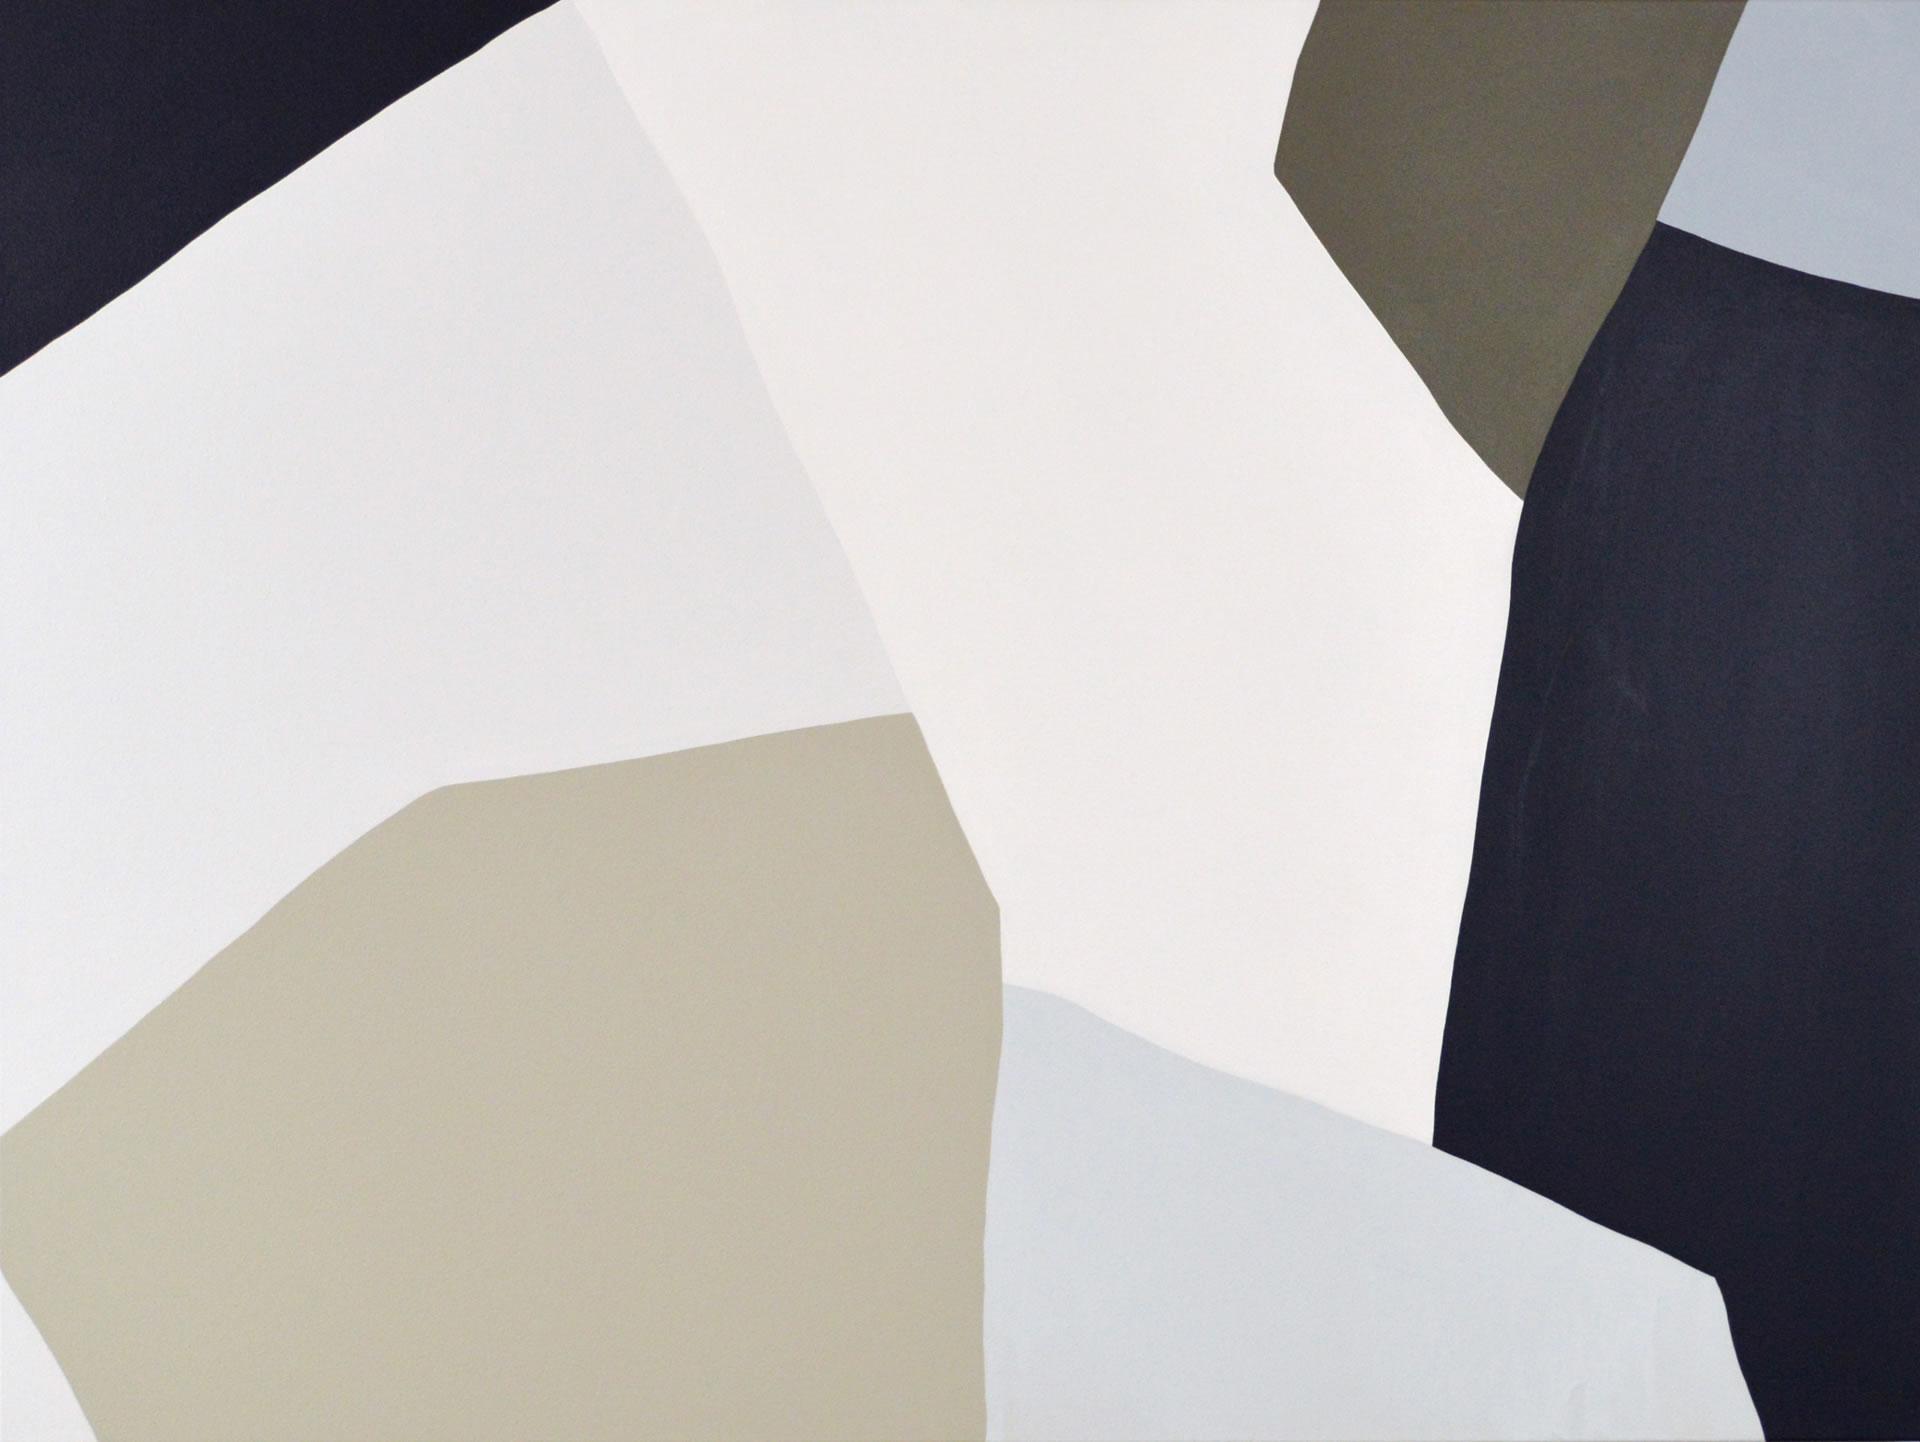 Lesley-Anderson-Reverie-36x48-Online-Art-Galleries